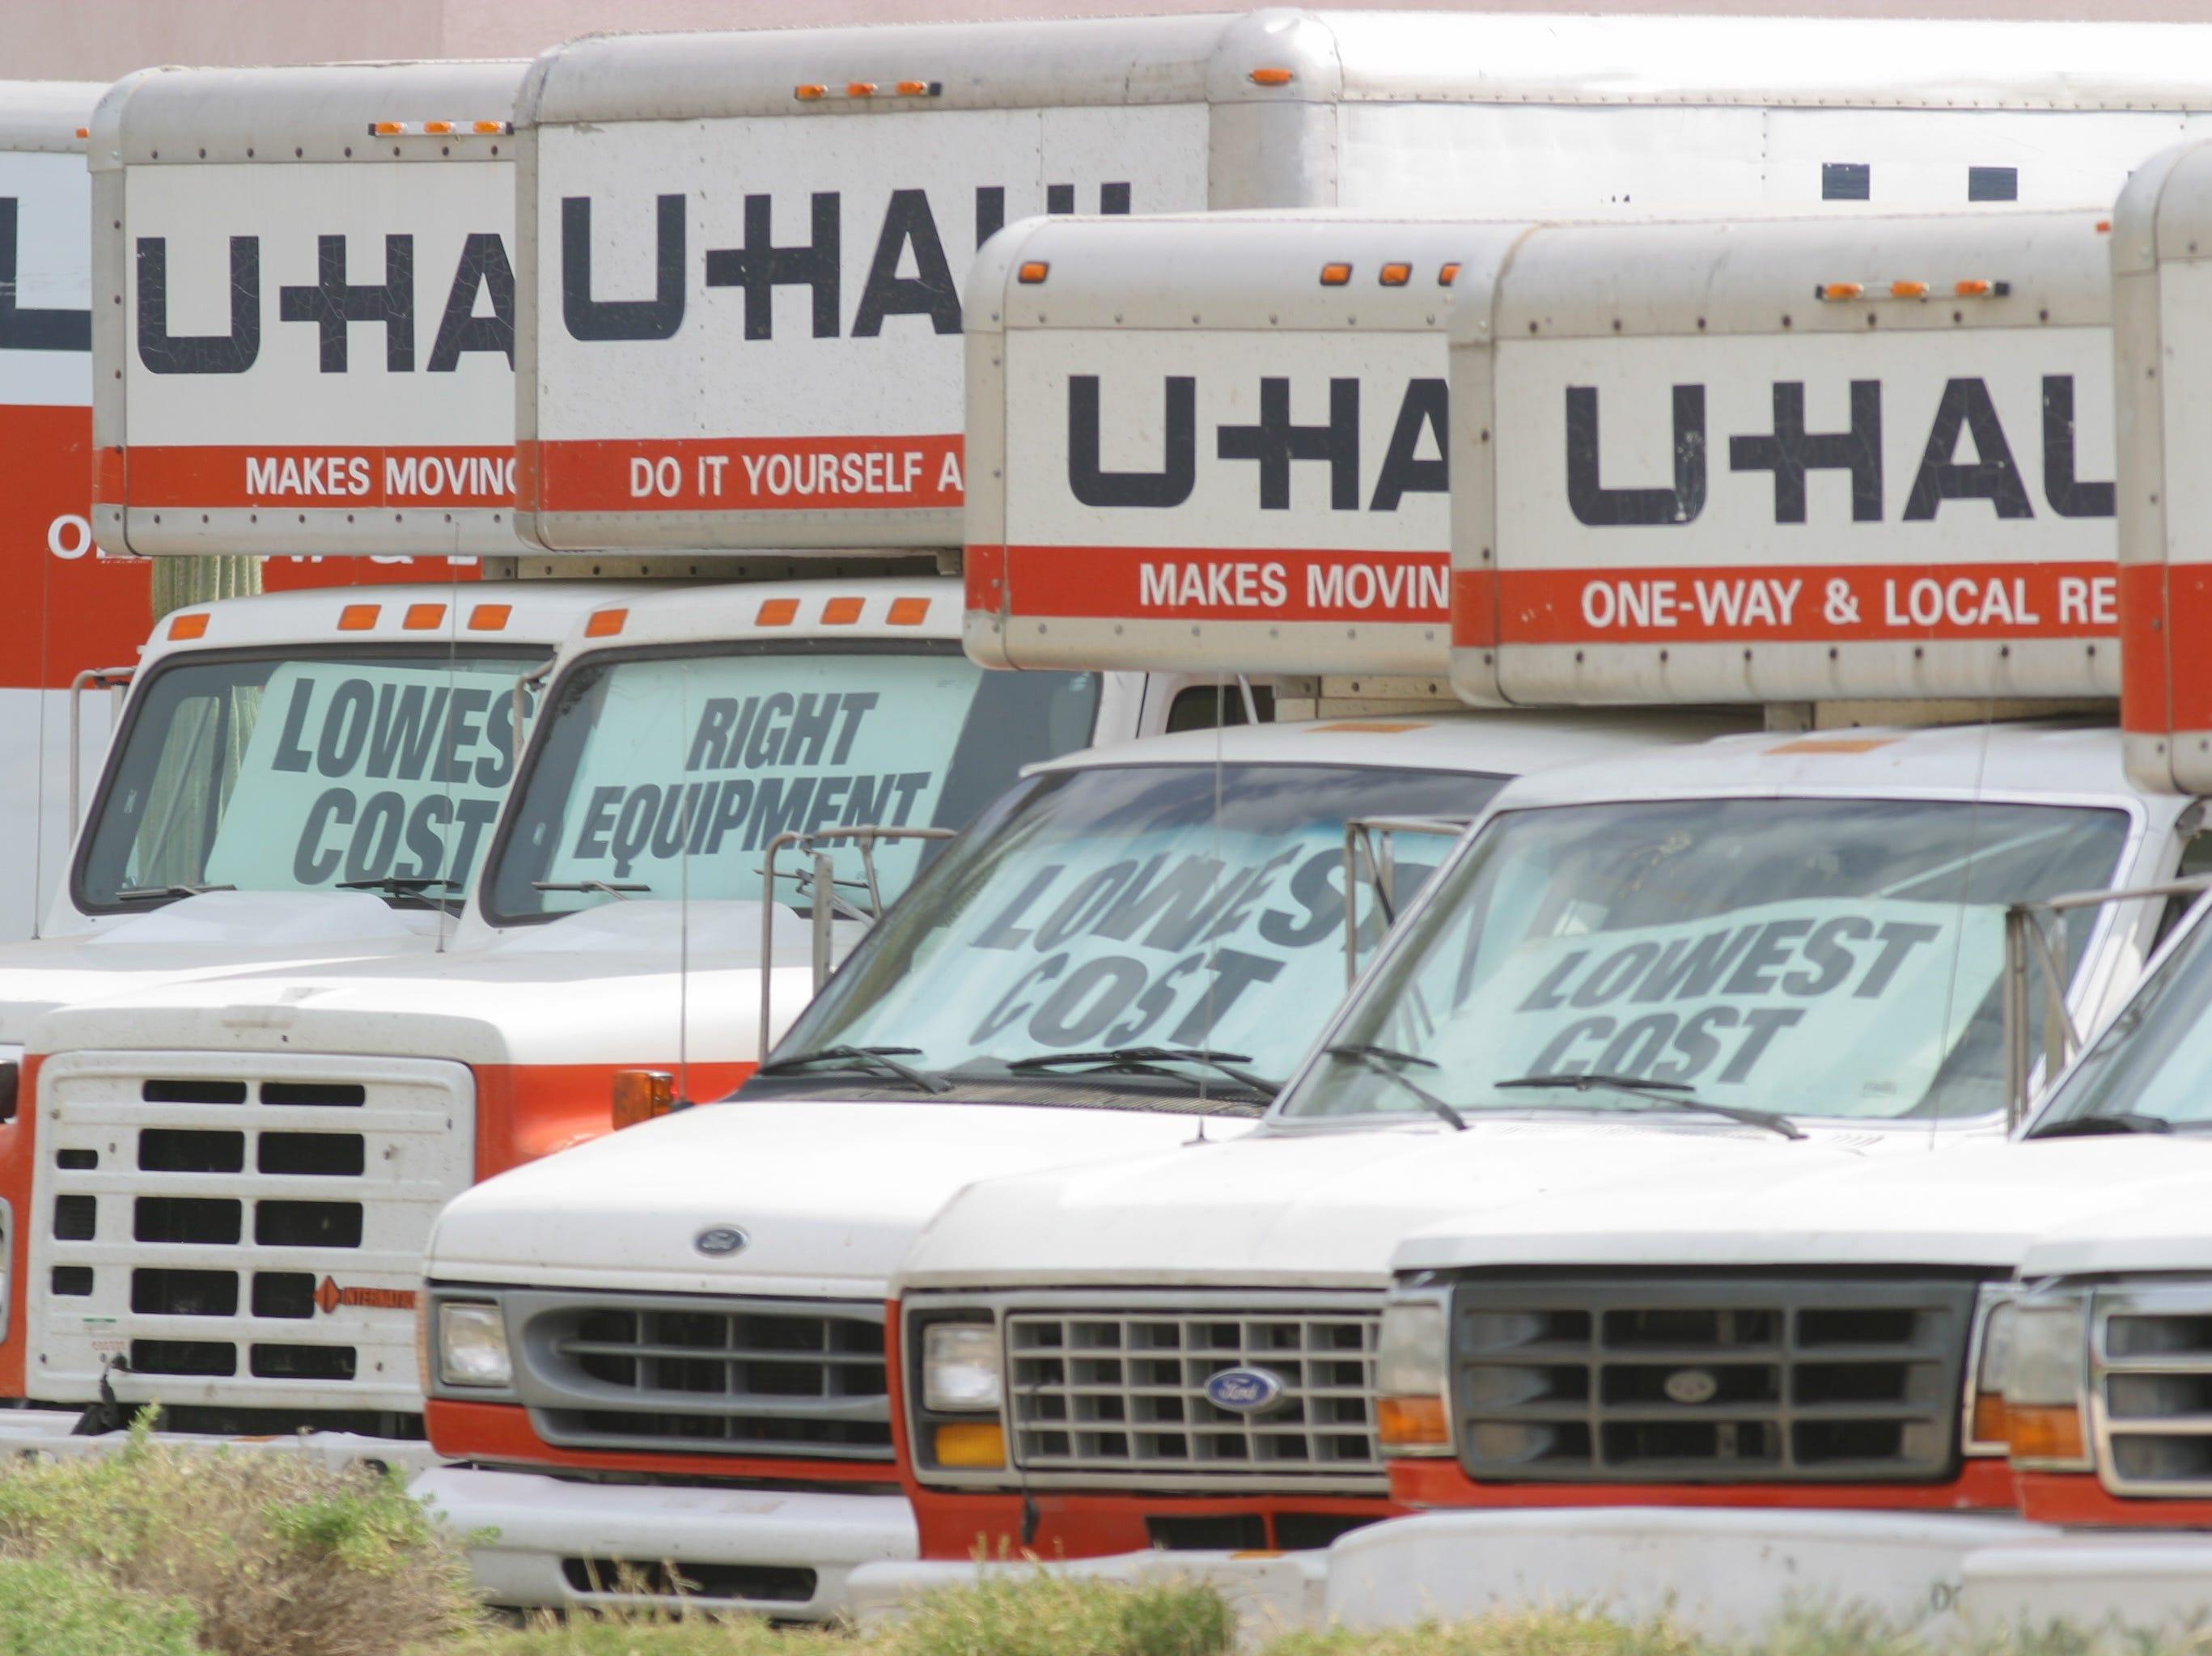 No. 46: Amerco | U-Haul truck, equipment rentals | 2019 employees: 3,843 | 2018 employees: 3,852 | Ownership: Public | Headquarters: Phoenix | www.uhaul.com